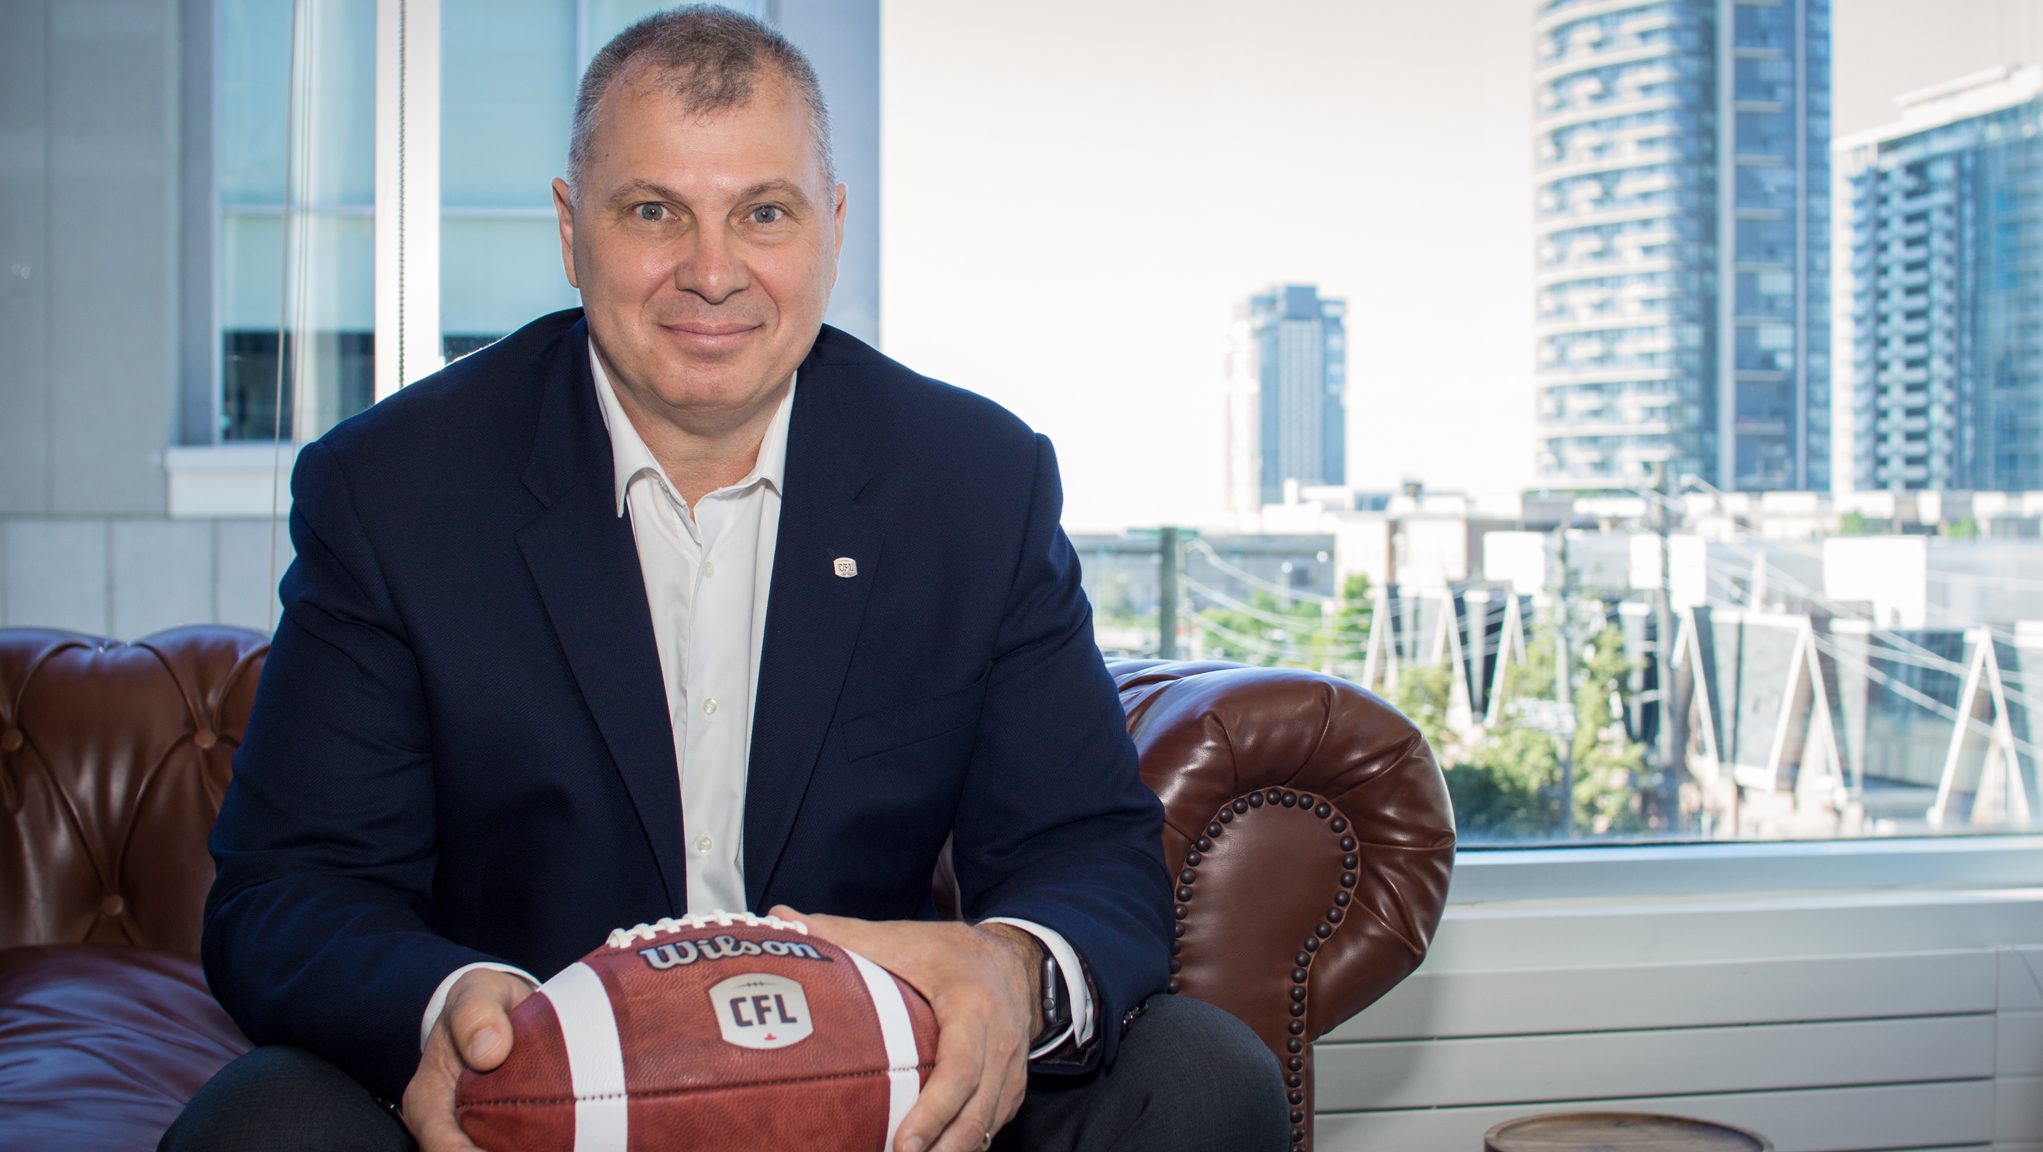 Ready To Go: Commissioner Ambrosie sizes up '21 season